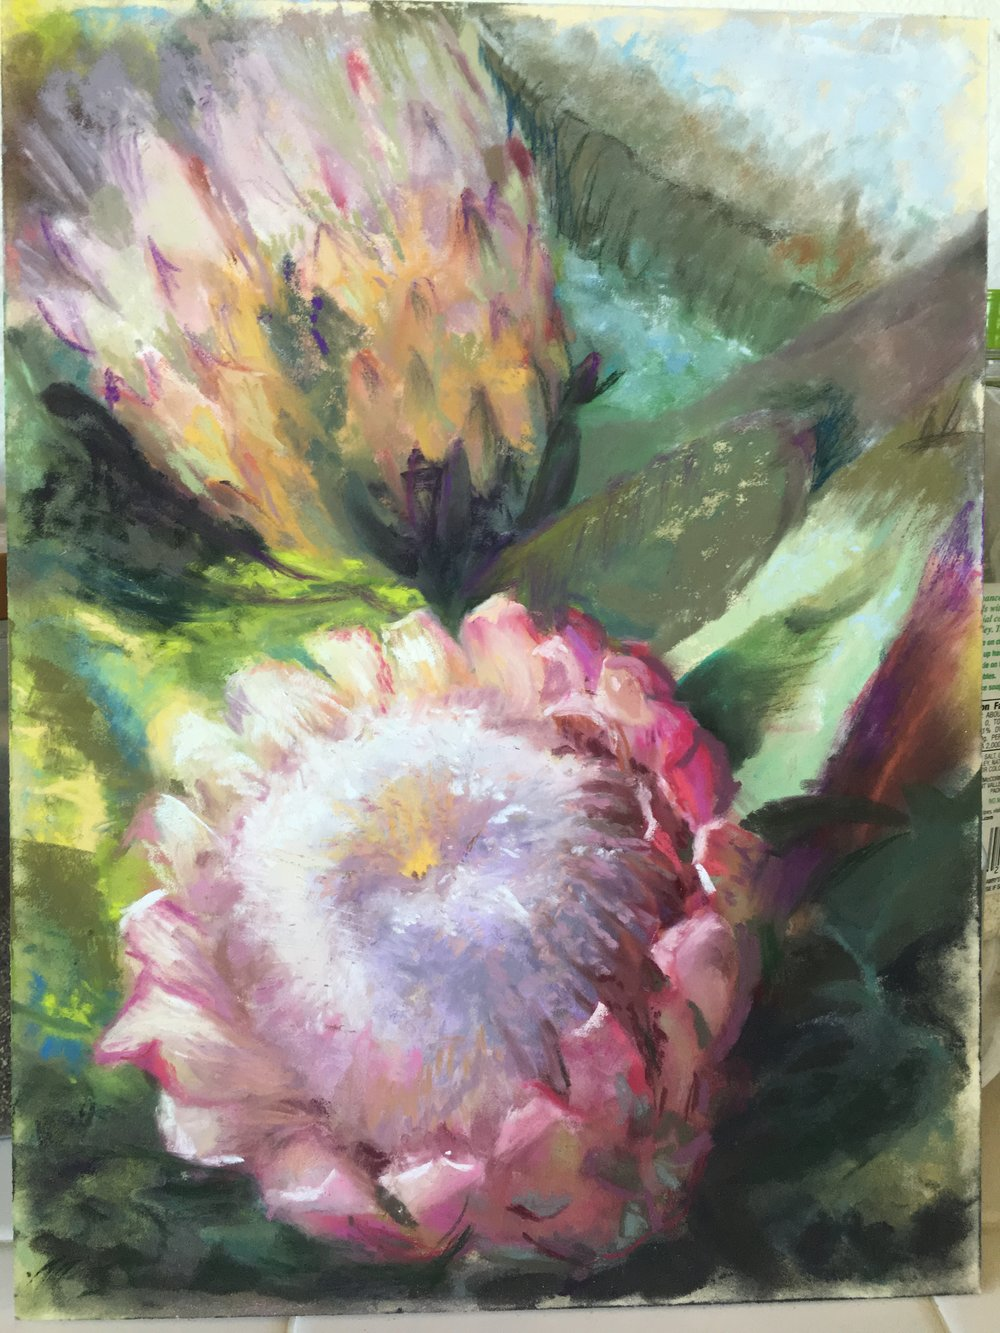 DAWN HARRISON PINK FLOWERS.JPG